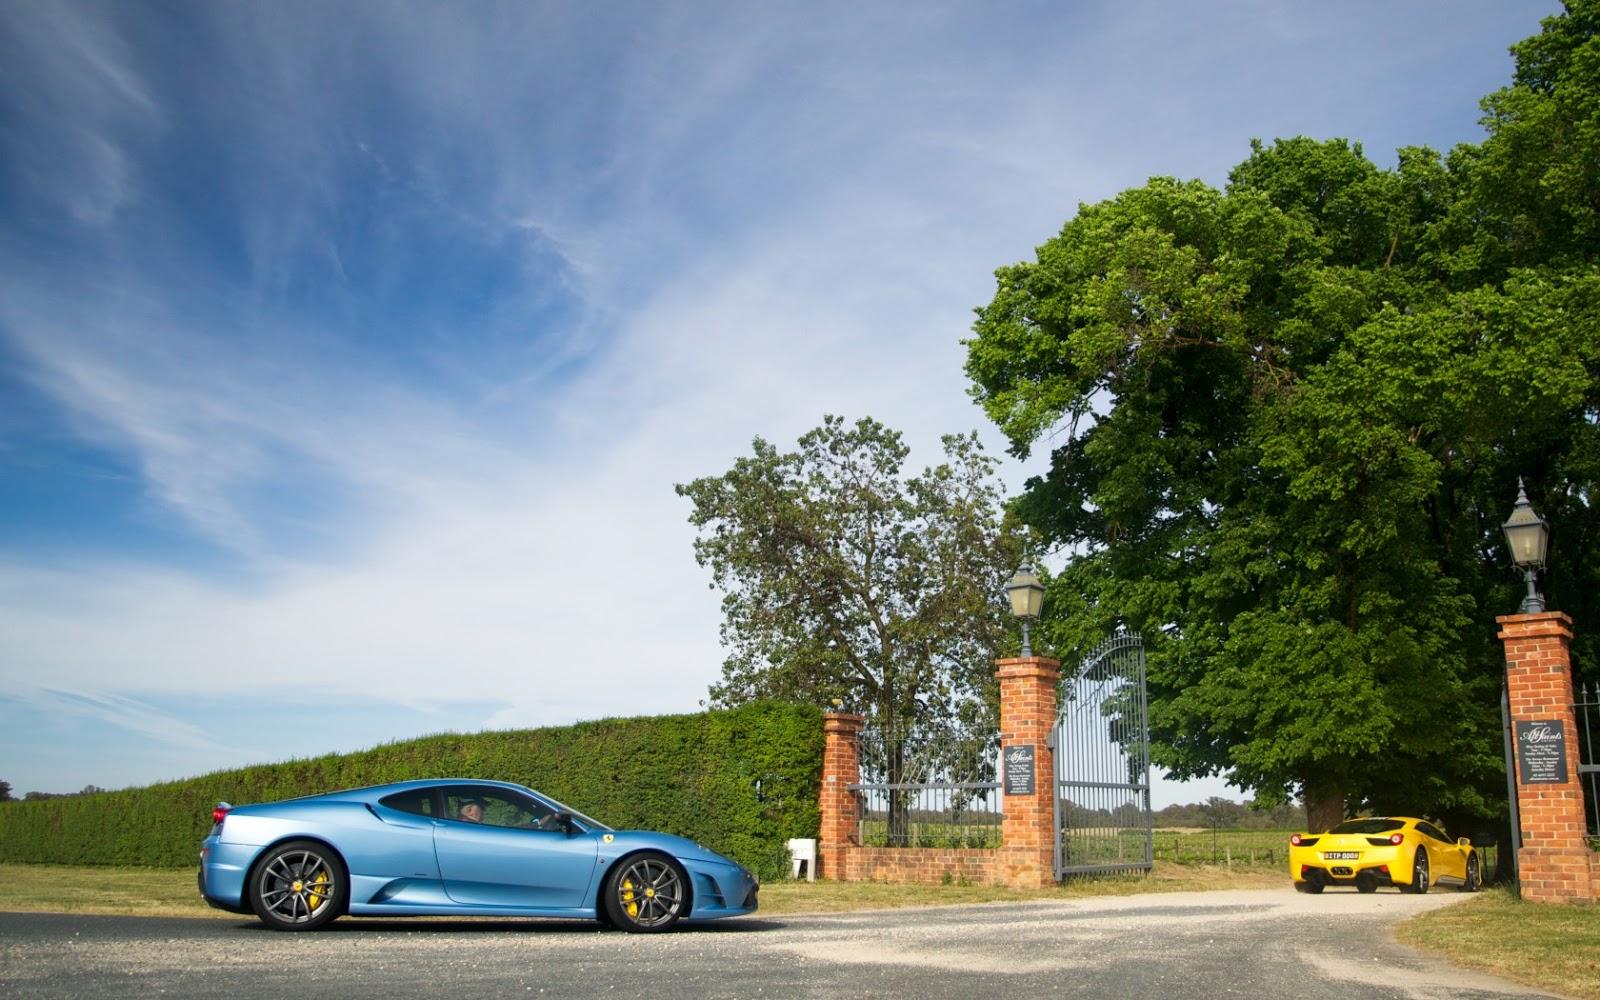 Ferrari hd wallpapers 1080p latest cars models collection wallpaper name ferrari hd wallpapers 1080p best resolution 1280x720 hd voltagebd Gallery